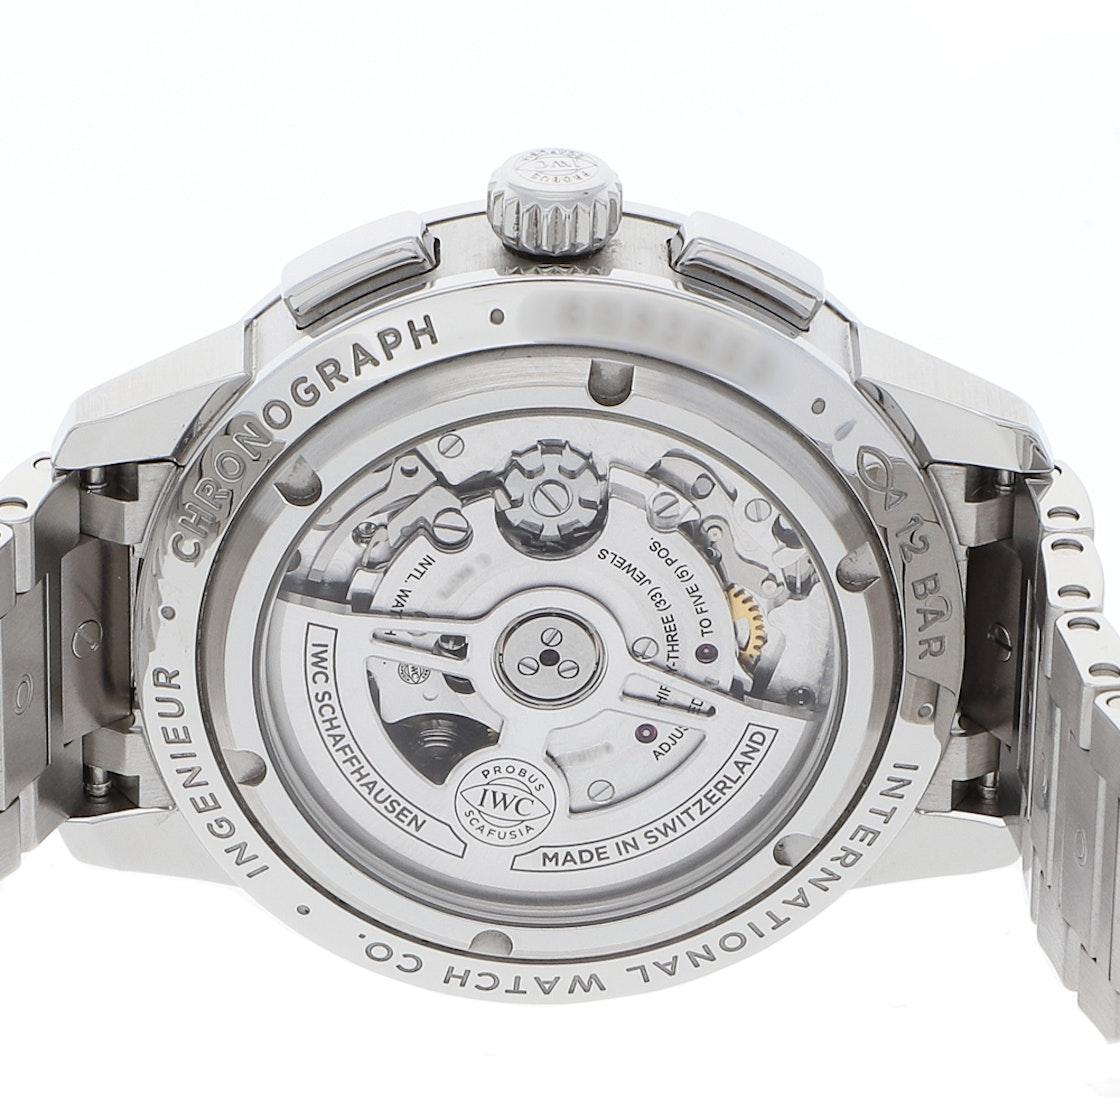 IWC Ingenieur Chronograph IW3808-02